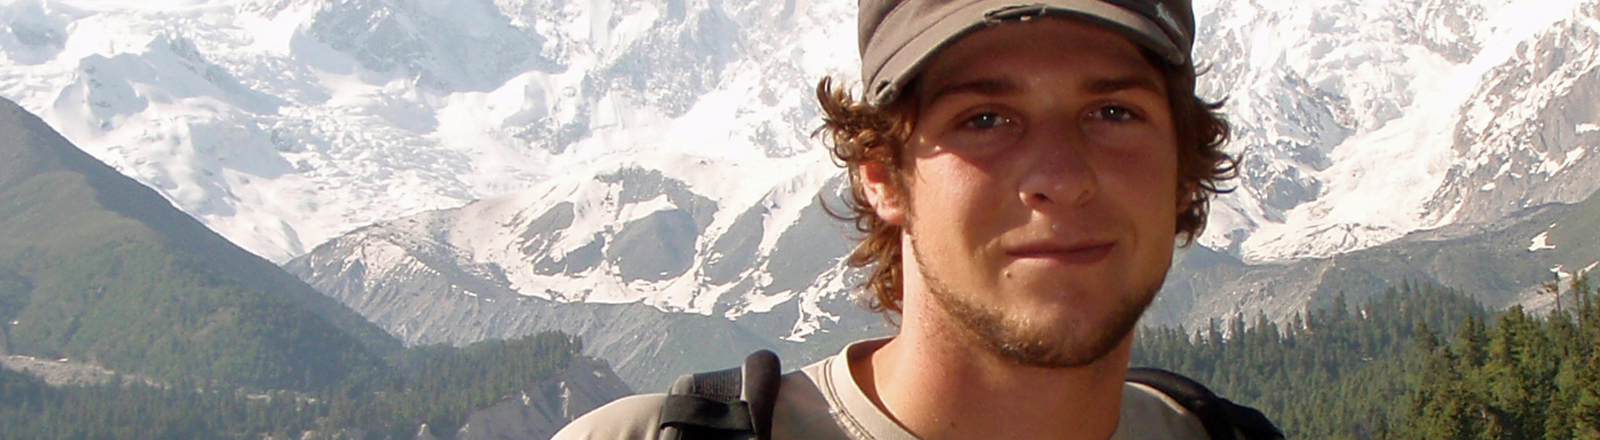 Sebastian Gaus steht vor dem Nanga Parbat in Afghanistan.